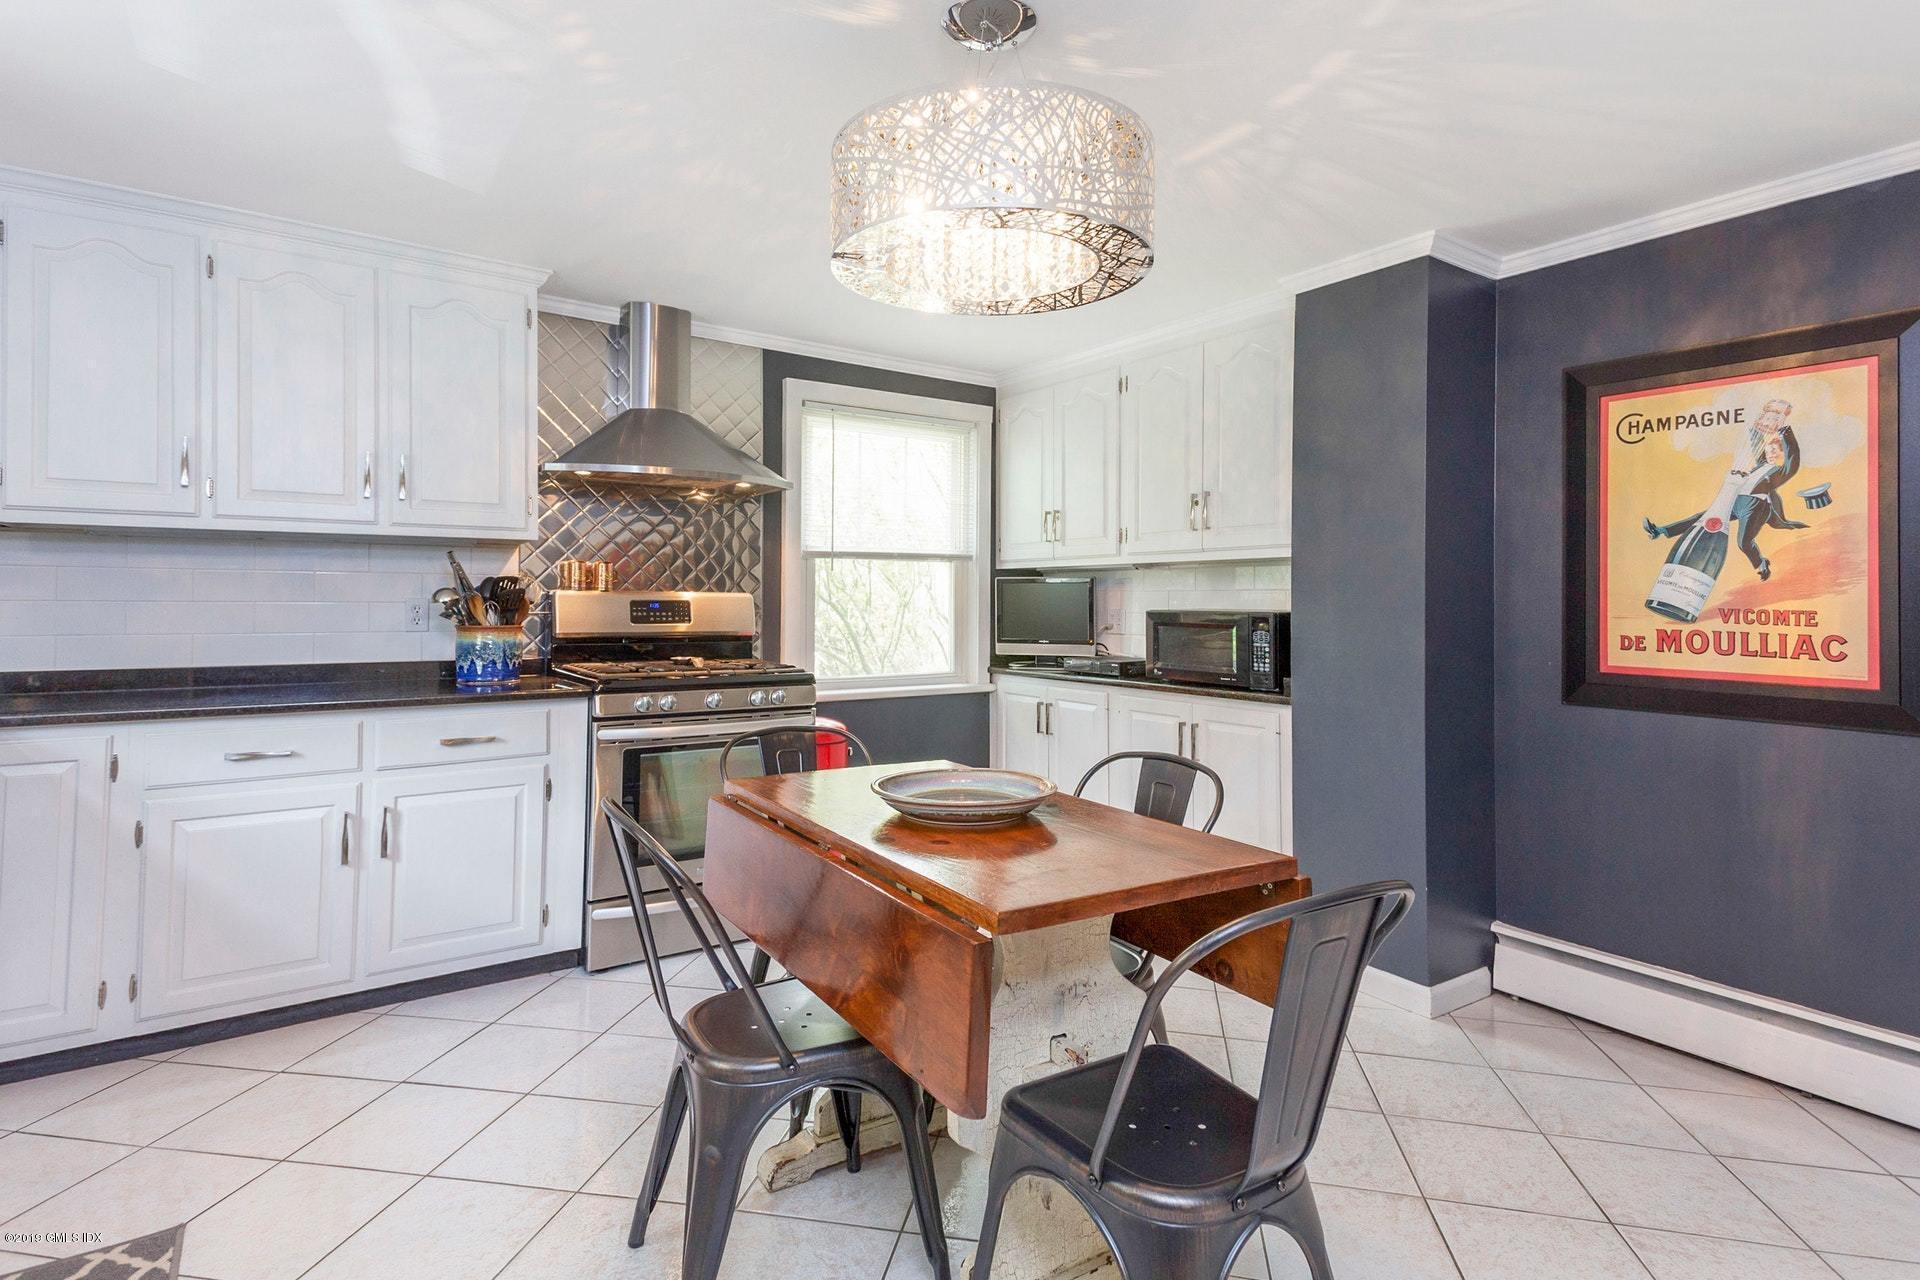 37 Meyer Place,Riverside,Connecticut 06878,6 Bedrooms Bedrooms,4 BathroomsBathrooms,Single family,Meyer,106965